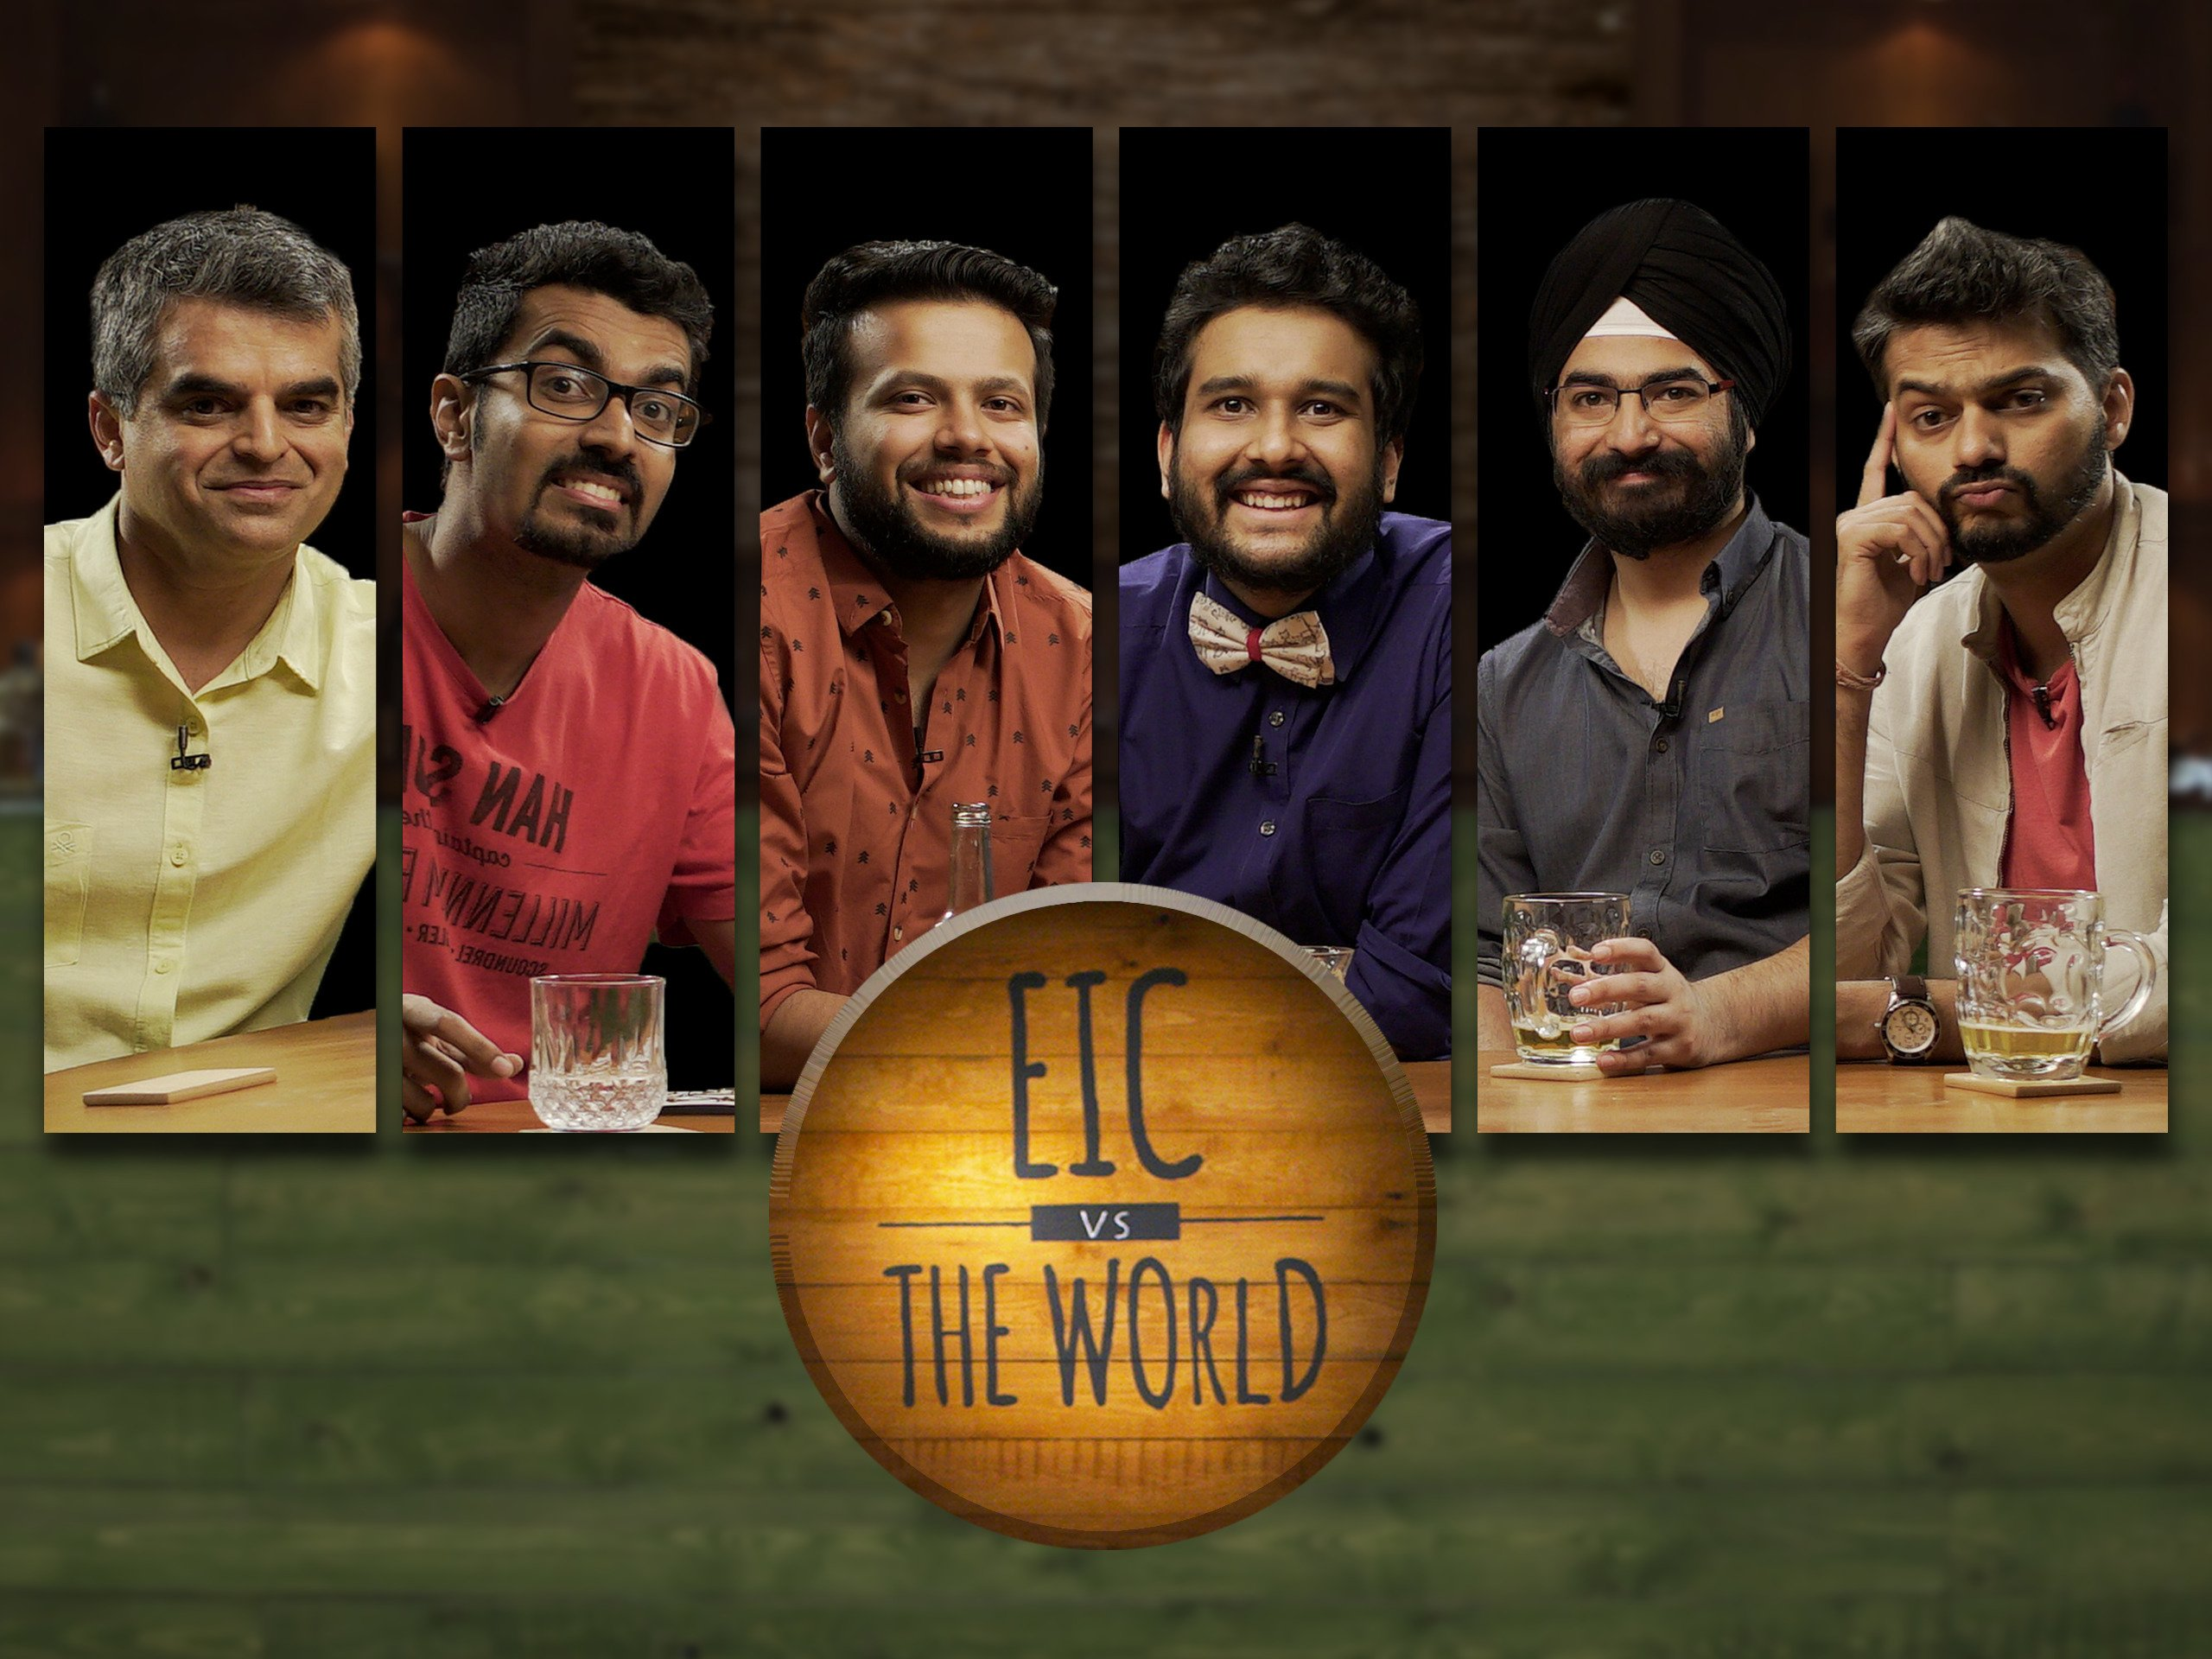 EIC vs The World-S1.0 - Season 1